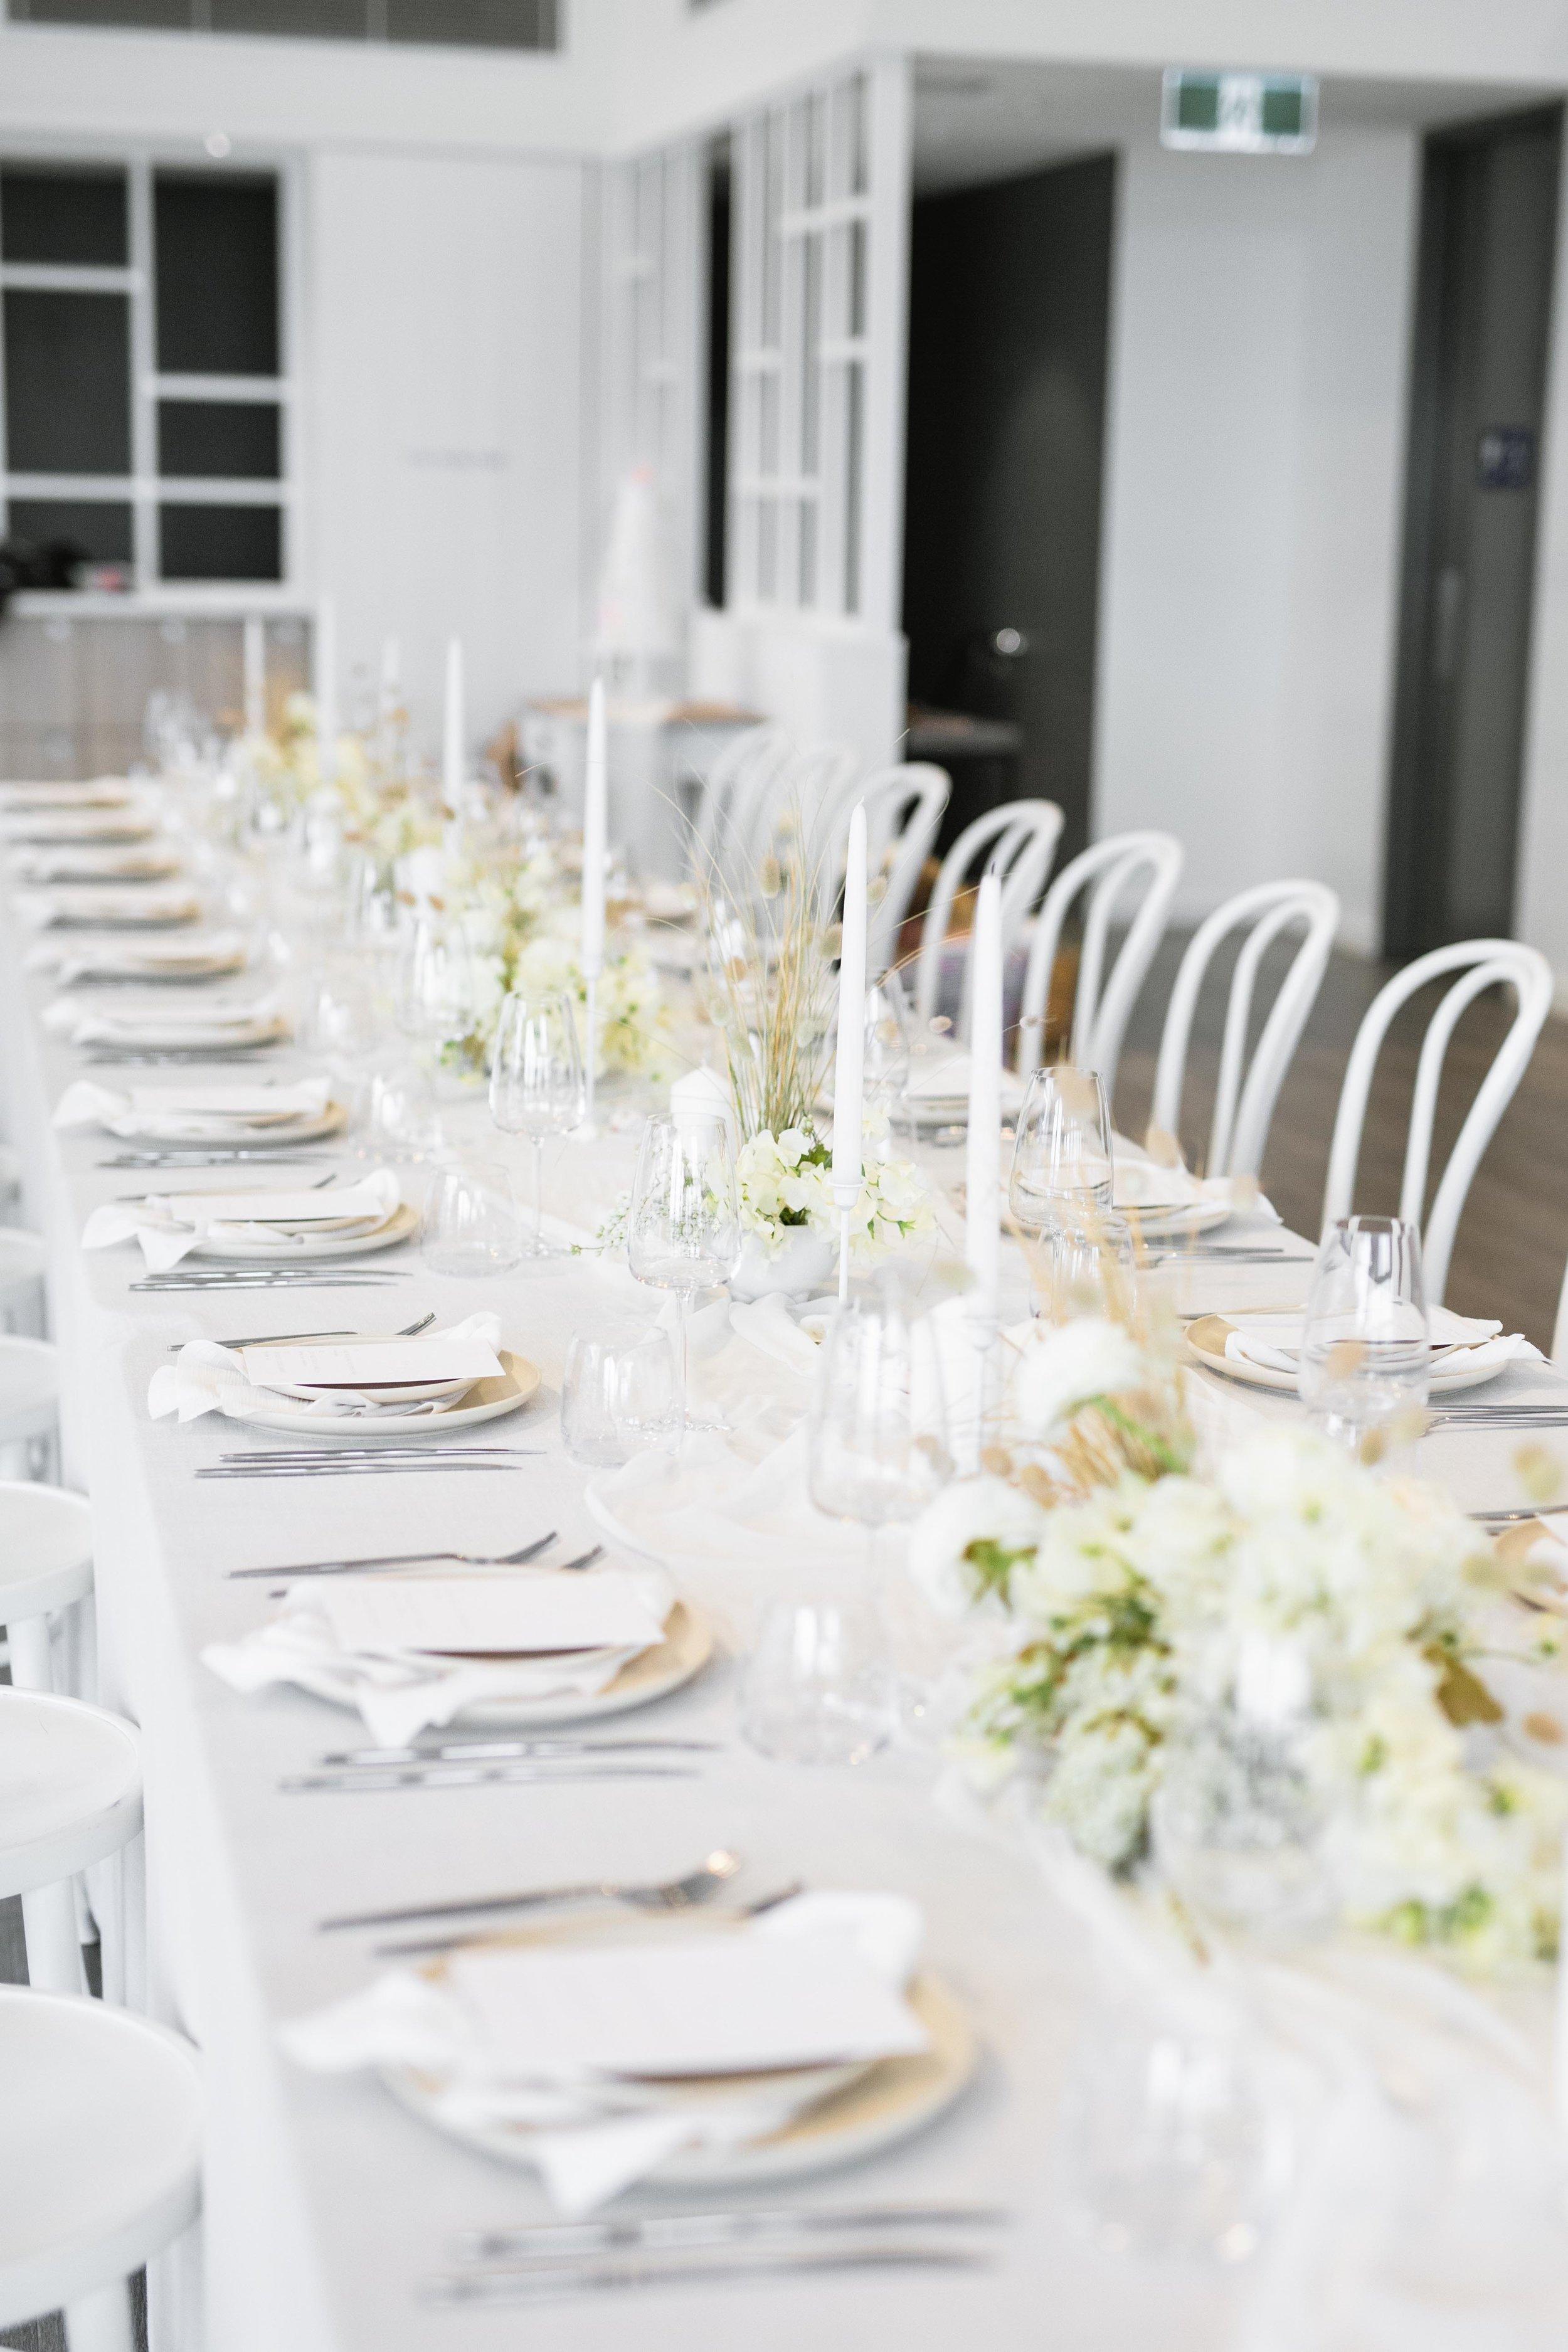 Fremantle Wedding Walk - Blue HQ, Perth Wedding Venue -  Tessa Kit Photography -JQ9A8597.jpg